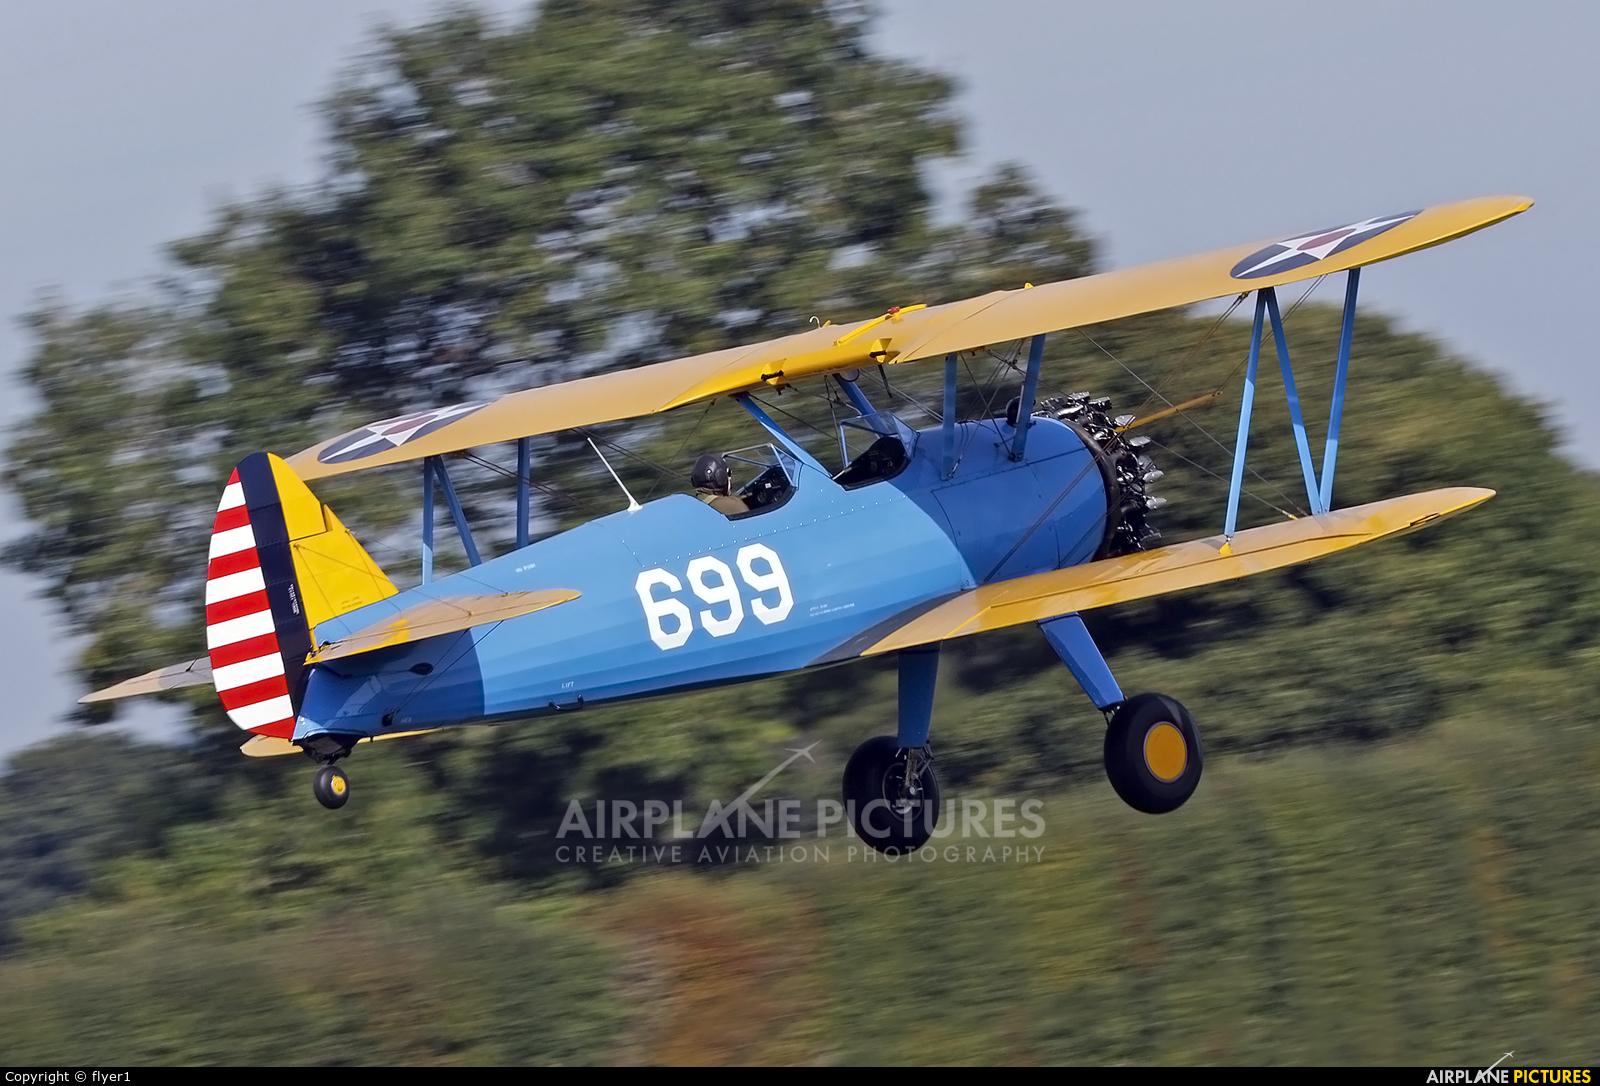 Private G-CCXB aircraft at Lashenden / Headcorn